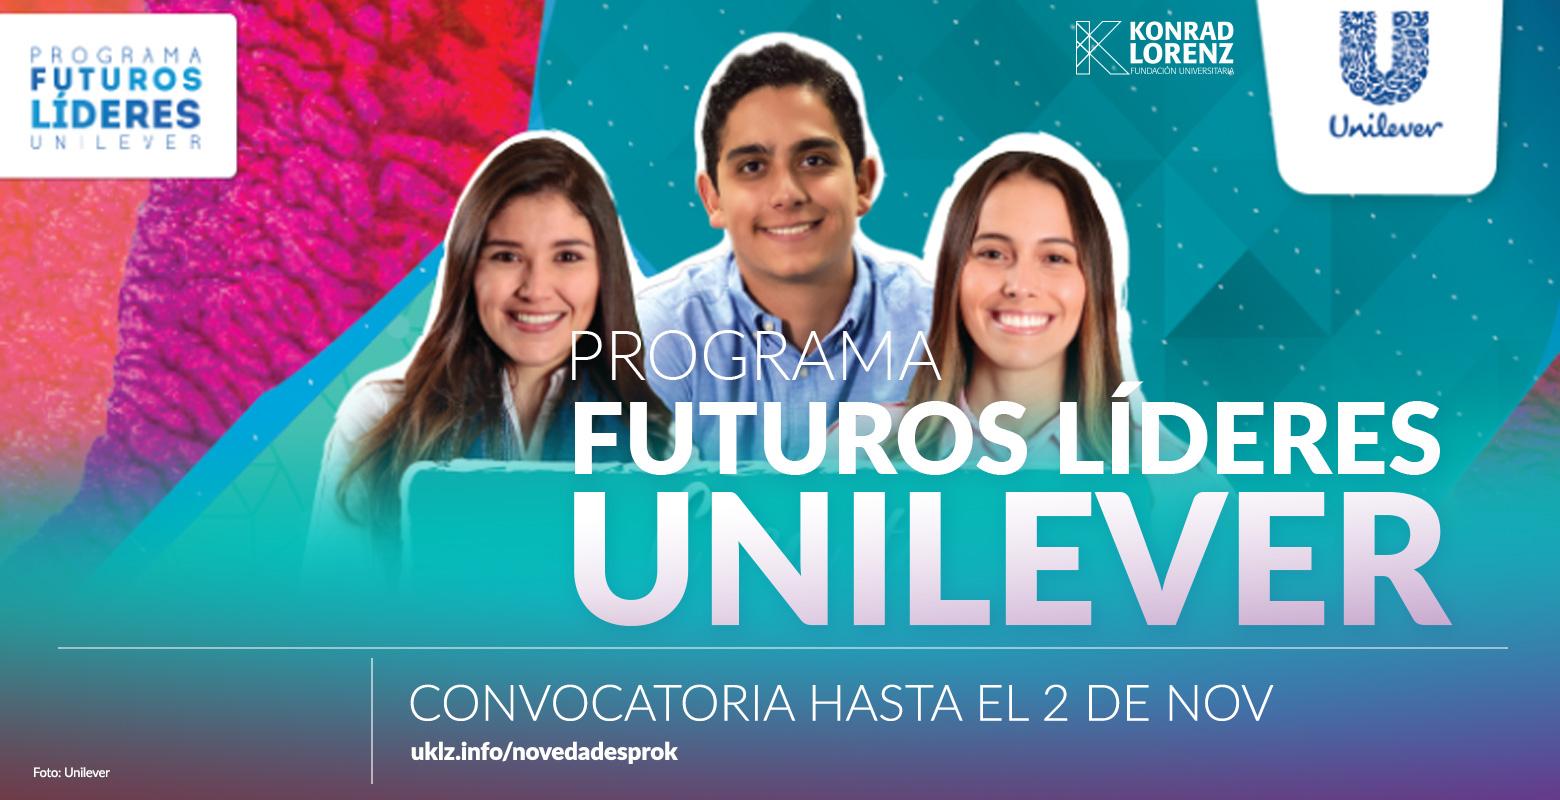 Programa de Futuros Líderes-Trainees 2017 Unilever 2017